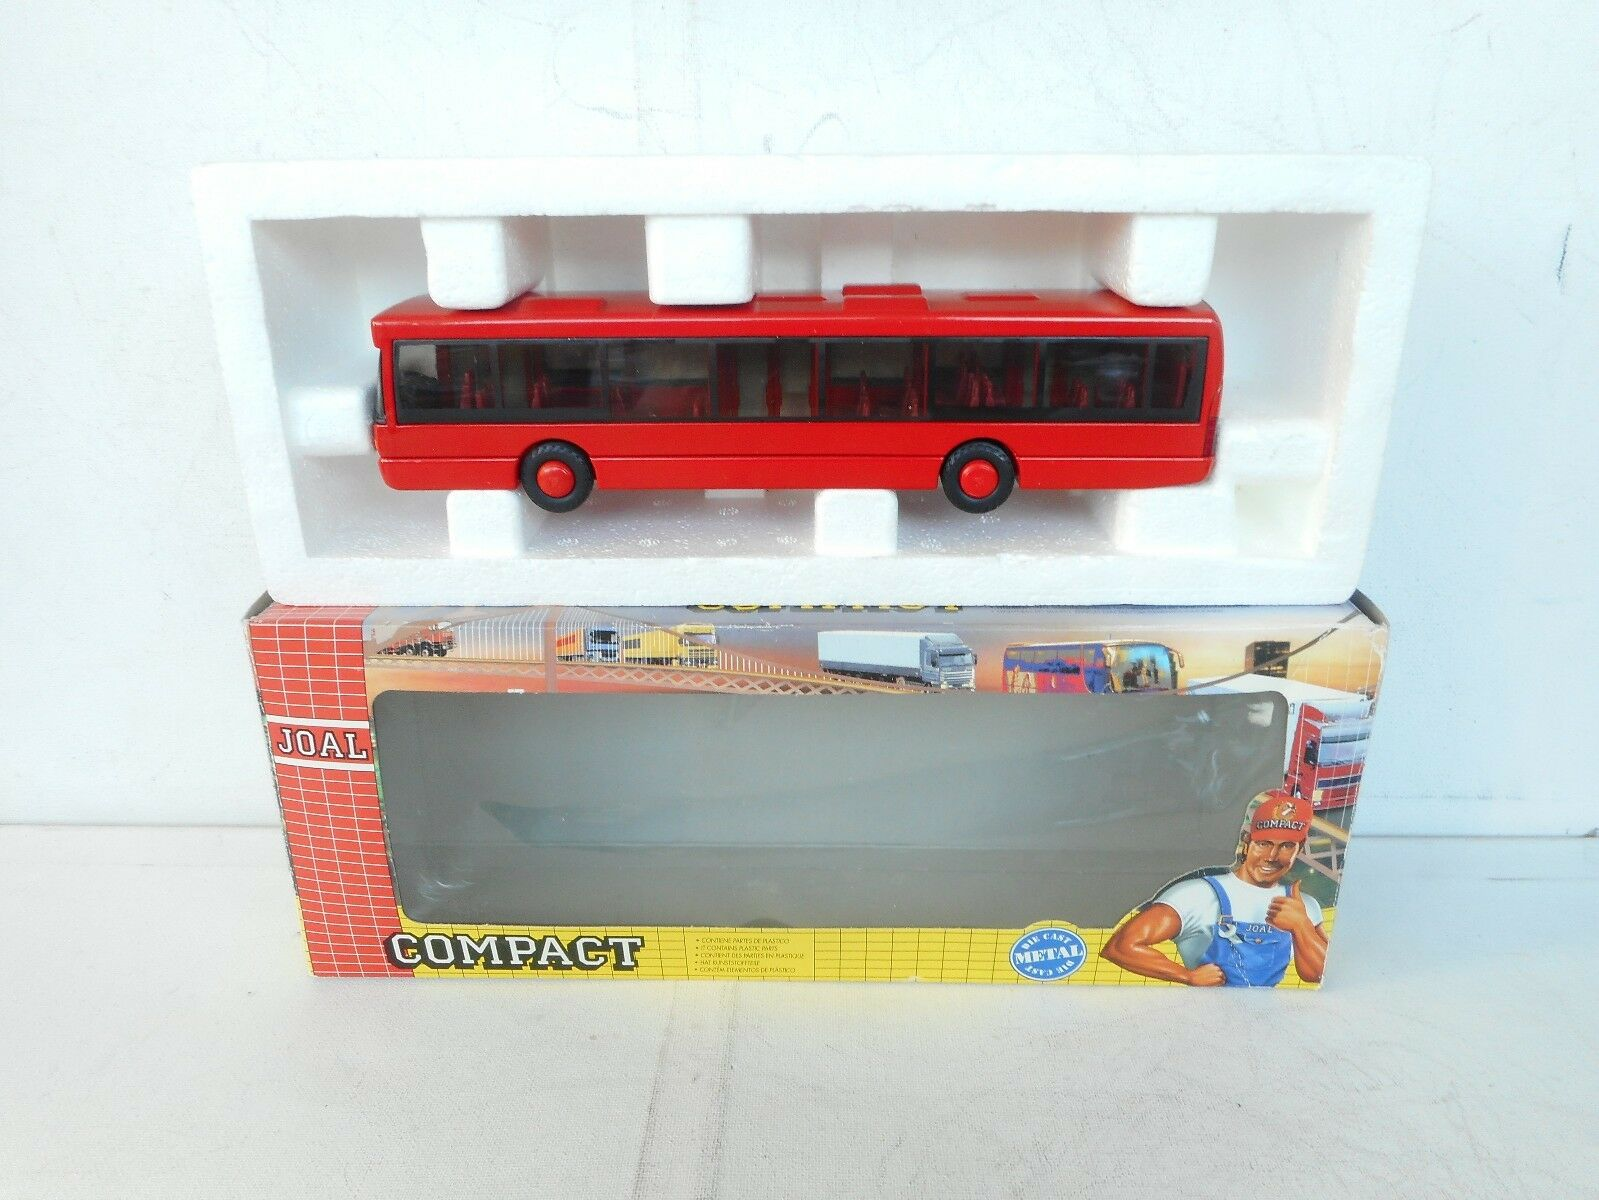 JOAL JOAL JOAL Compact Ref 155 SCANIA OMNICITY Autobus  RED LINE  NM  Boxed 1 50 b91cff